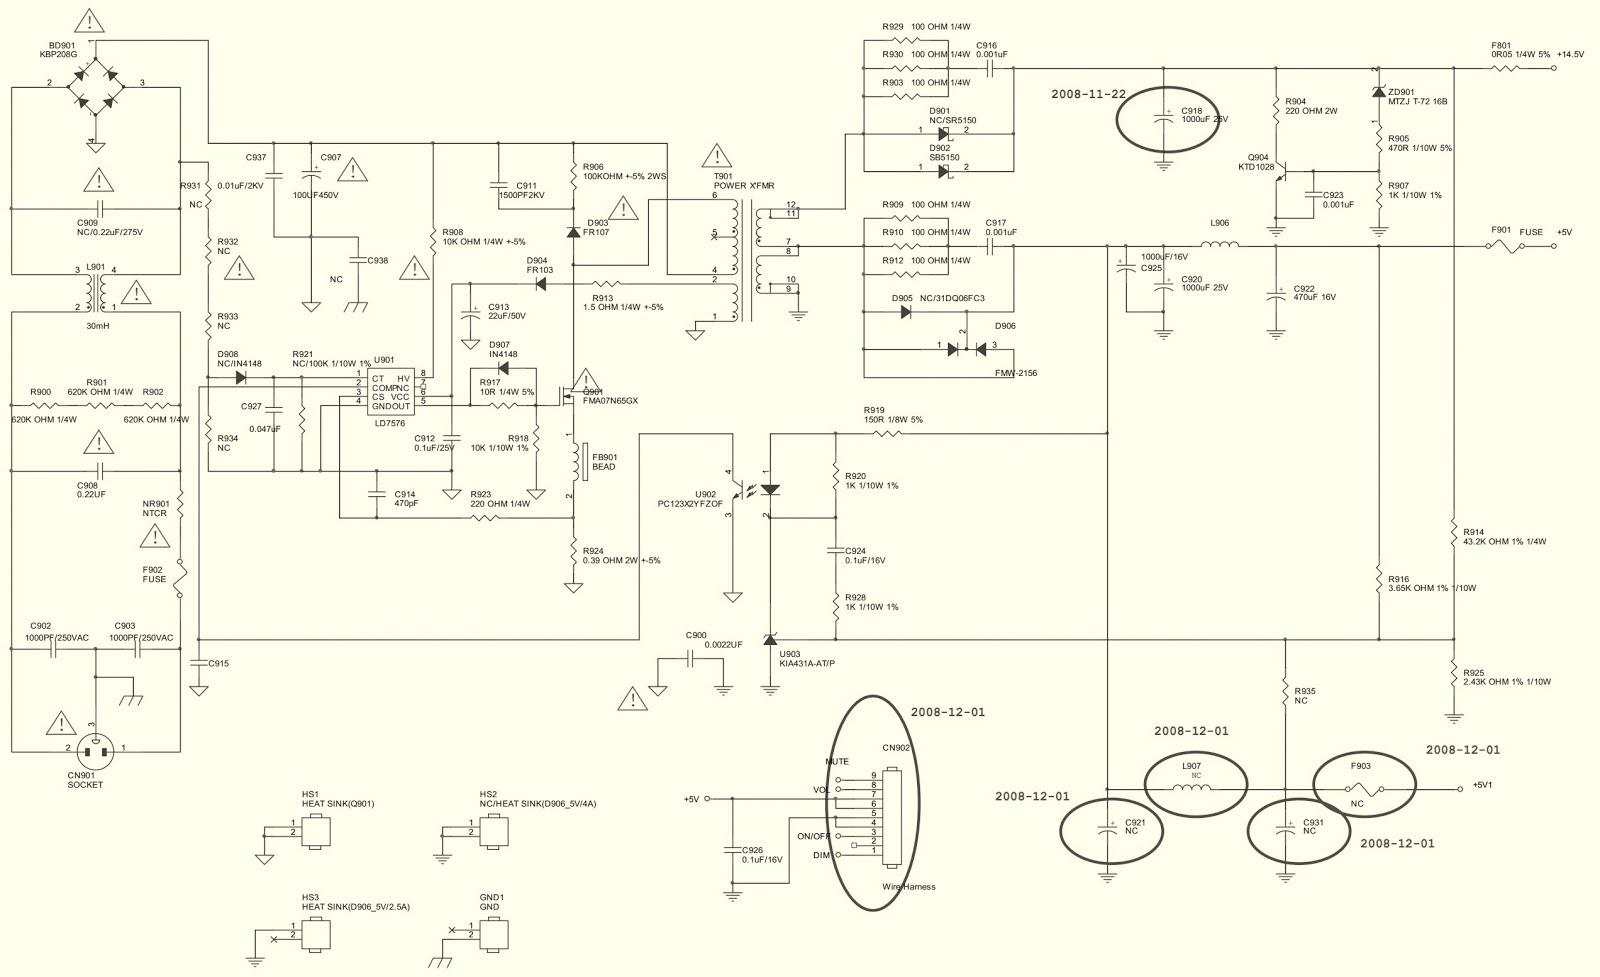 small resolution of aoc2236vwa lcd monitor circuit diagram 7155g2892 power board dell lcd monitor schematic diagram lcd monitor schematic diagram